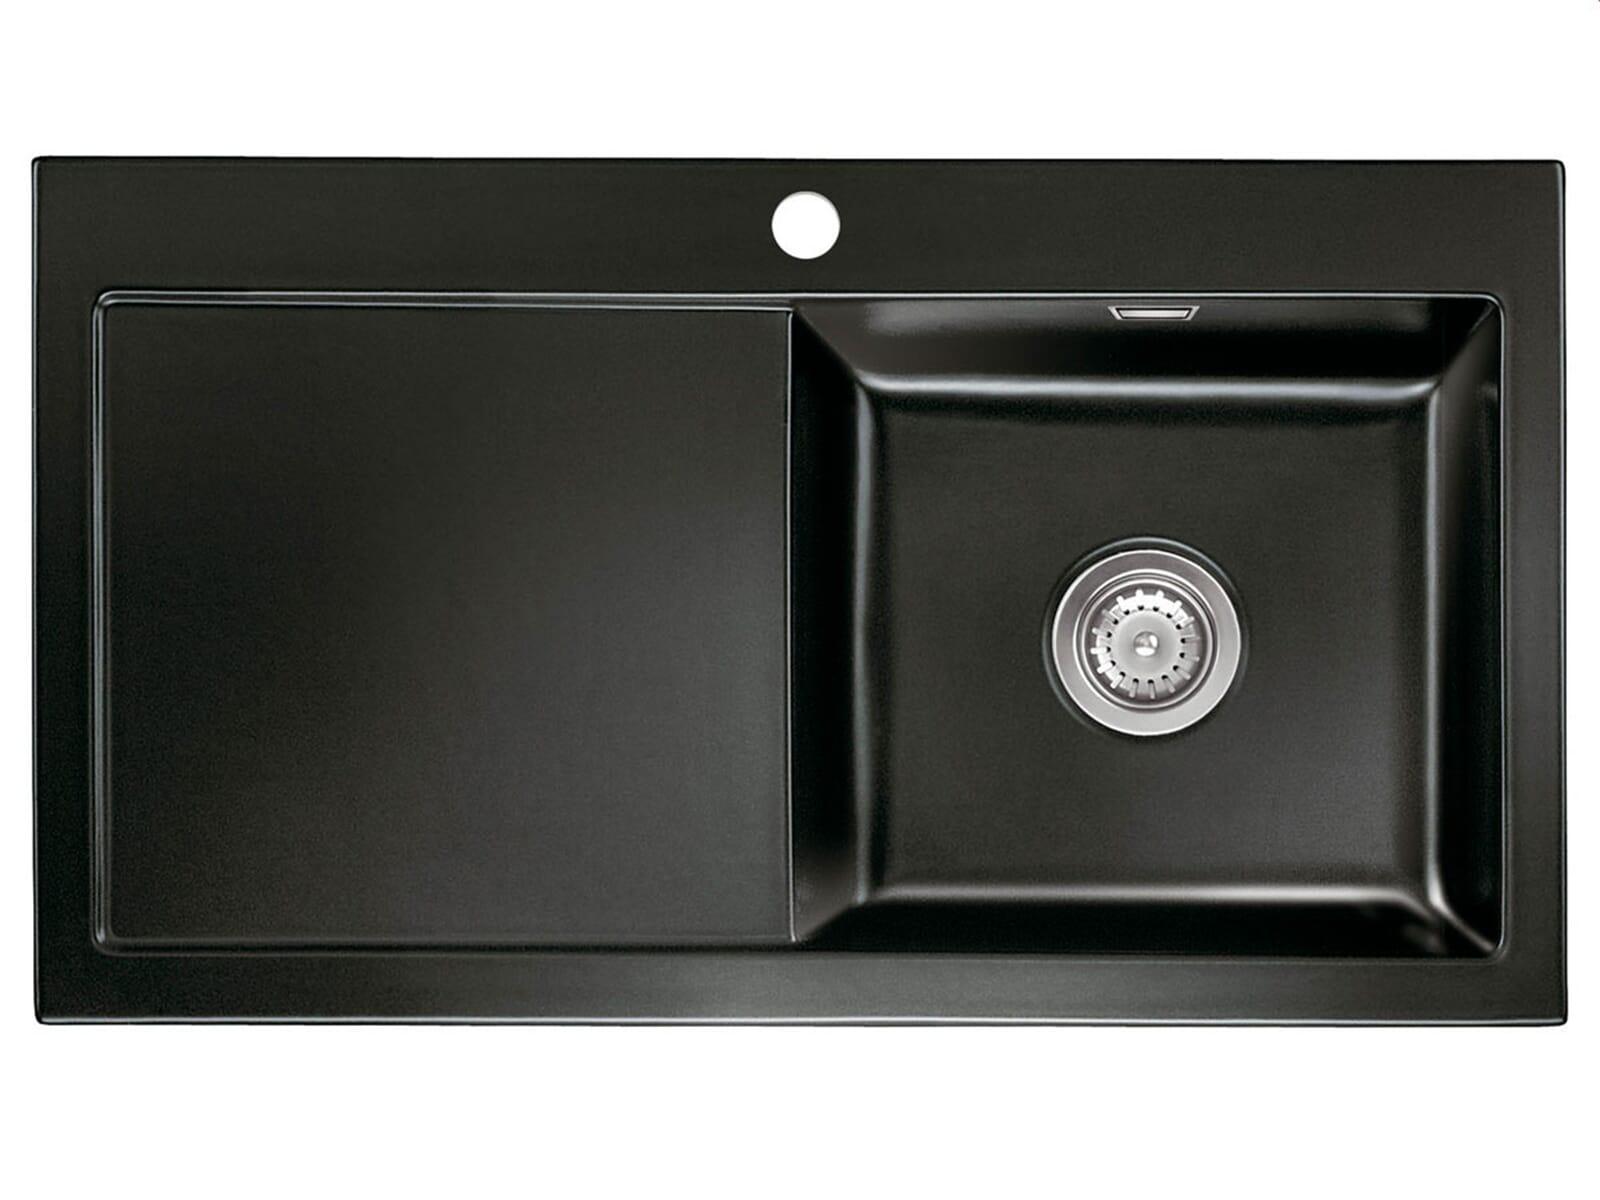 systemceram mera 90 nero keramiksp le handbet tigung. Black Bedroom Furniture Sets. Home Design Ideas